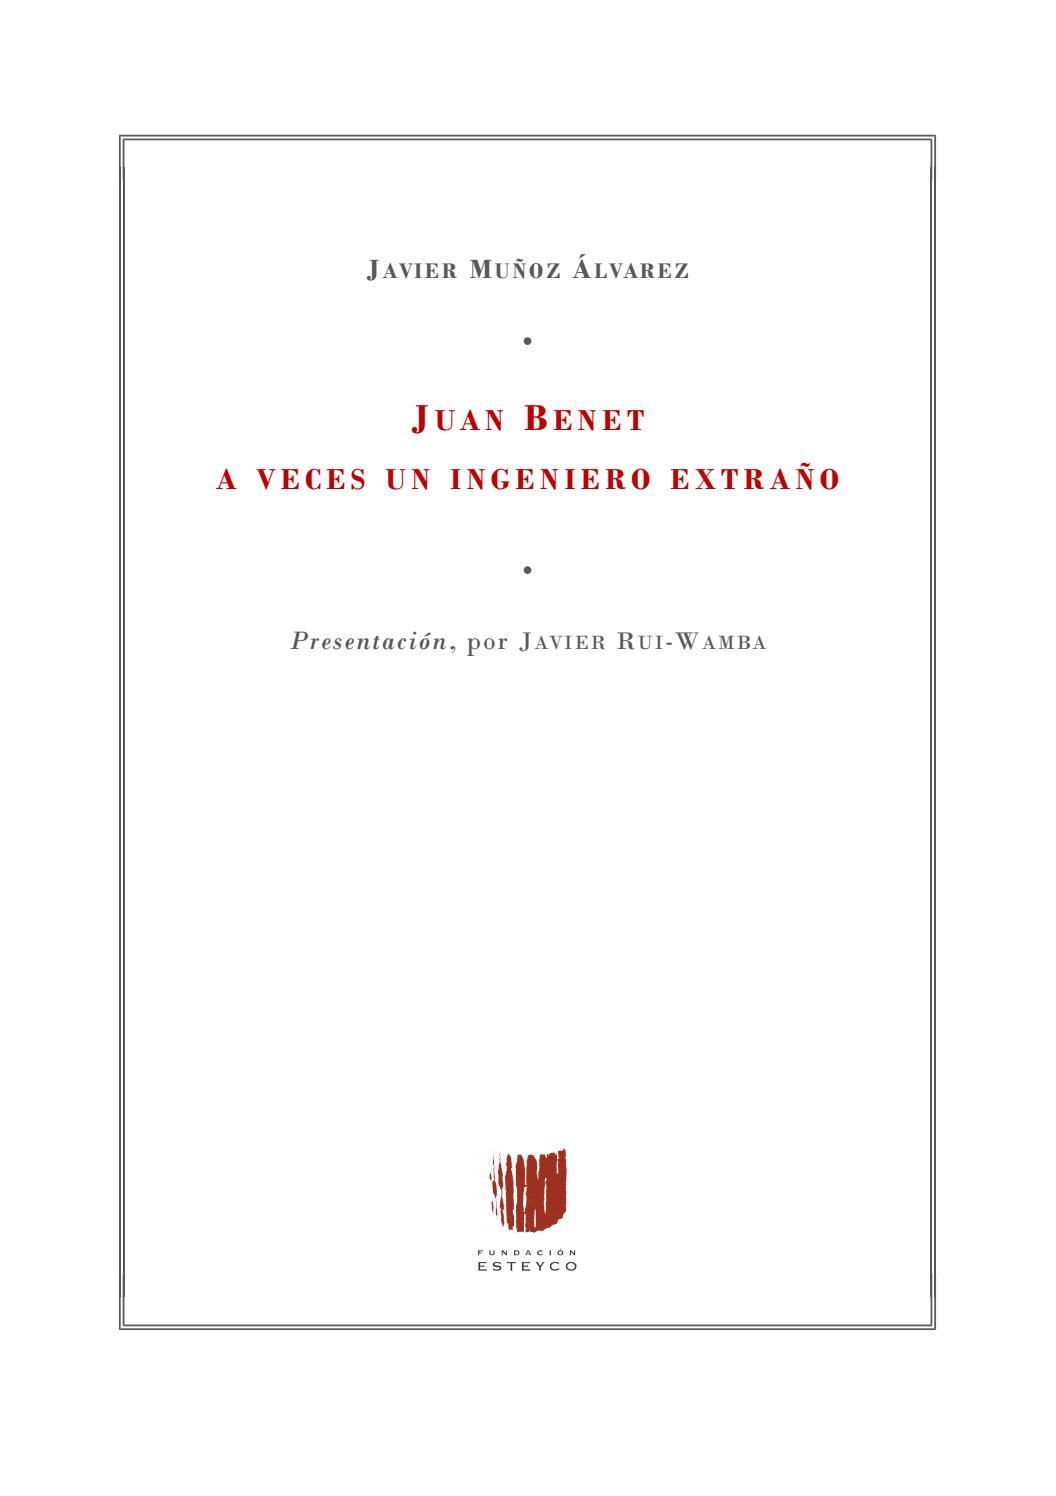 Juan Benet A veces un ingeniero extraño by Esteyco SAP - issuu